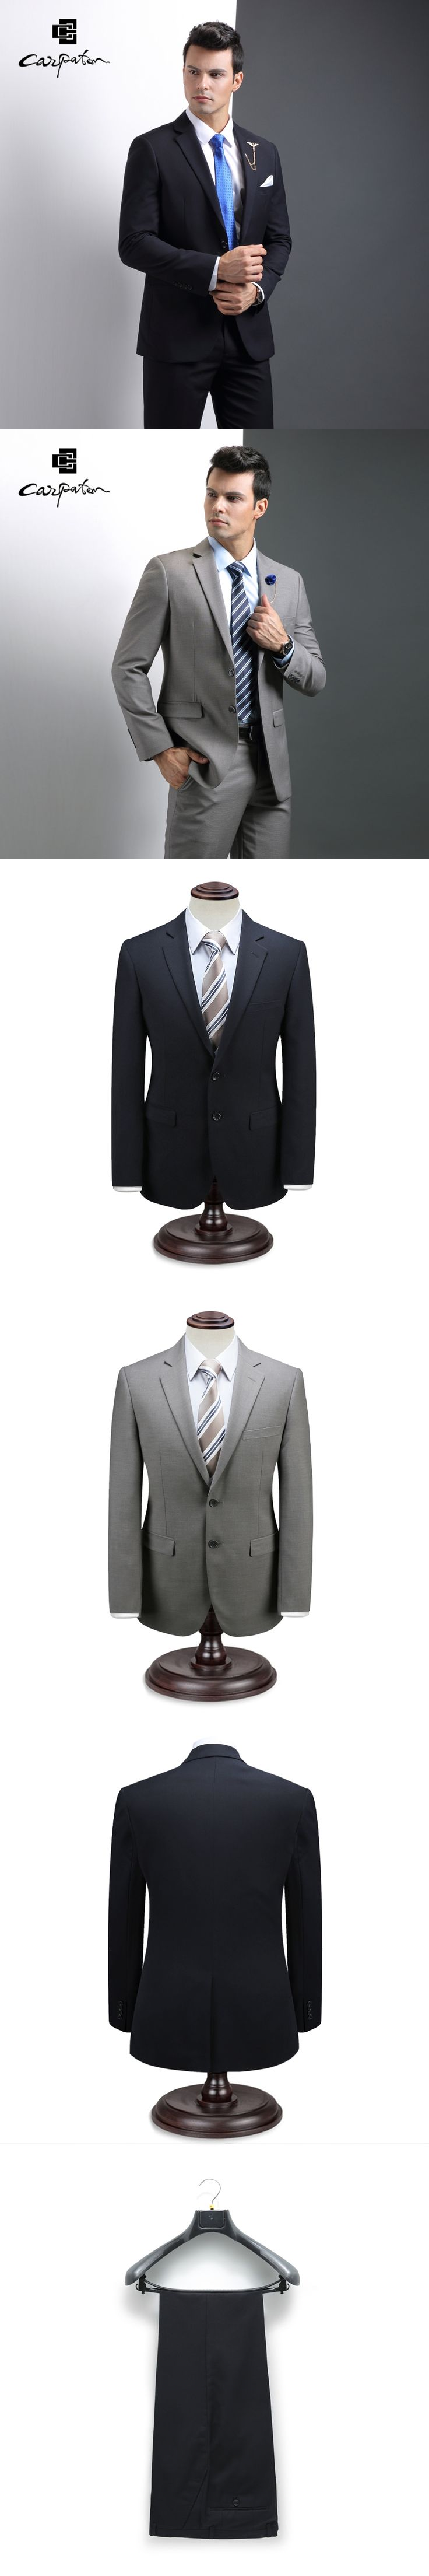 Carpaton Men Suit Gray Soild Wool Skinny Designer 2pcs Suit Brand Autumn Tuxedo Large Size Grooms Wedding Suits For Business Man